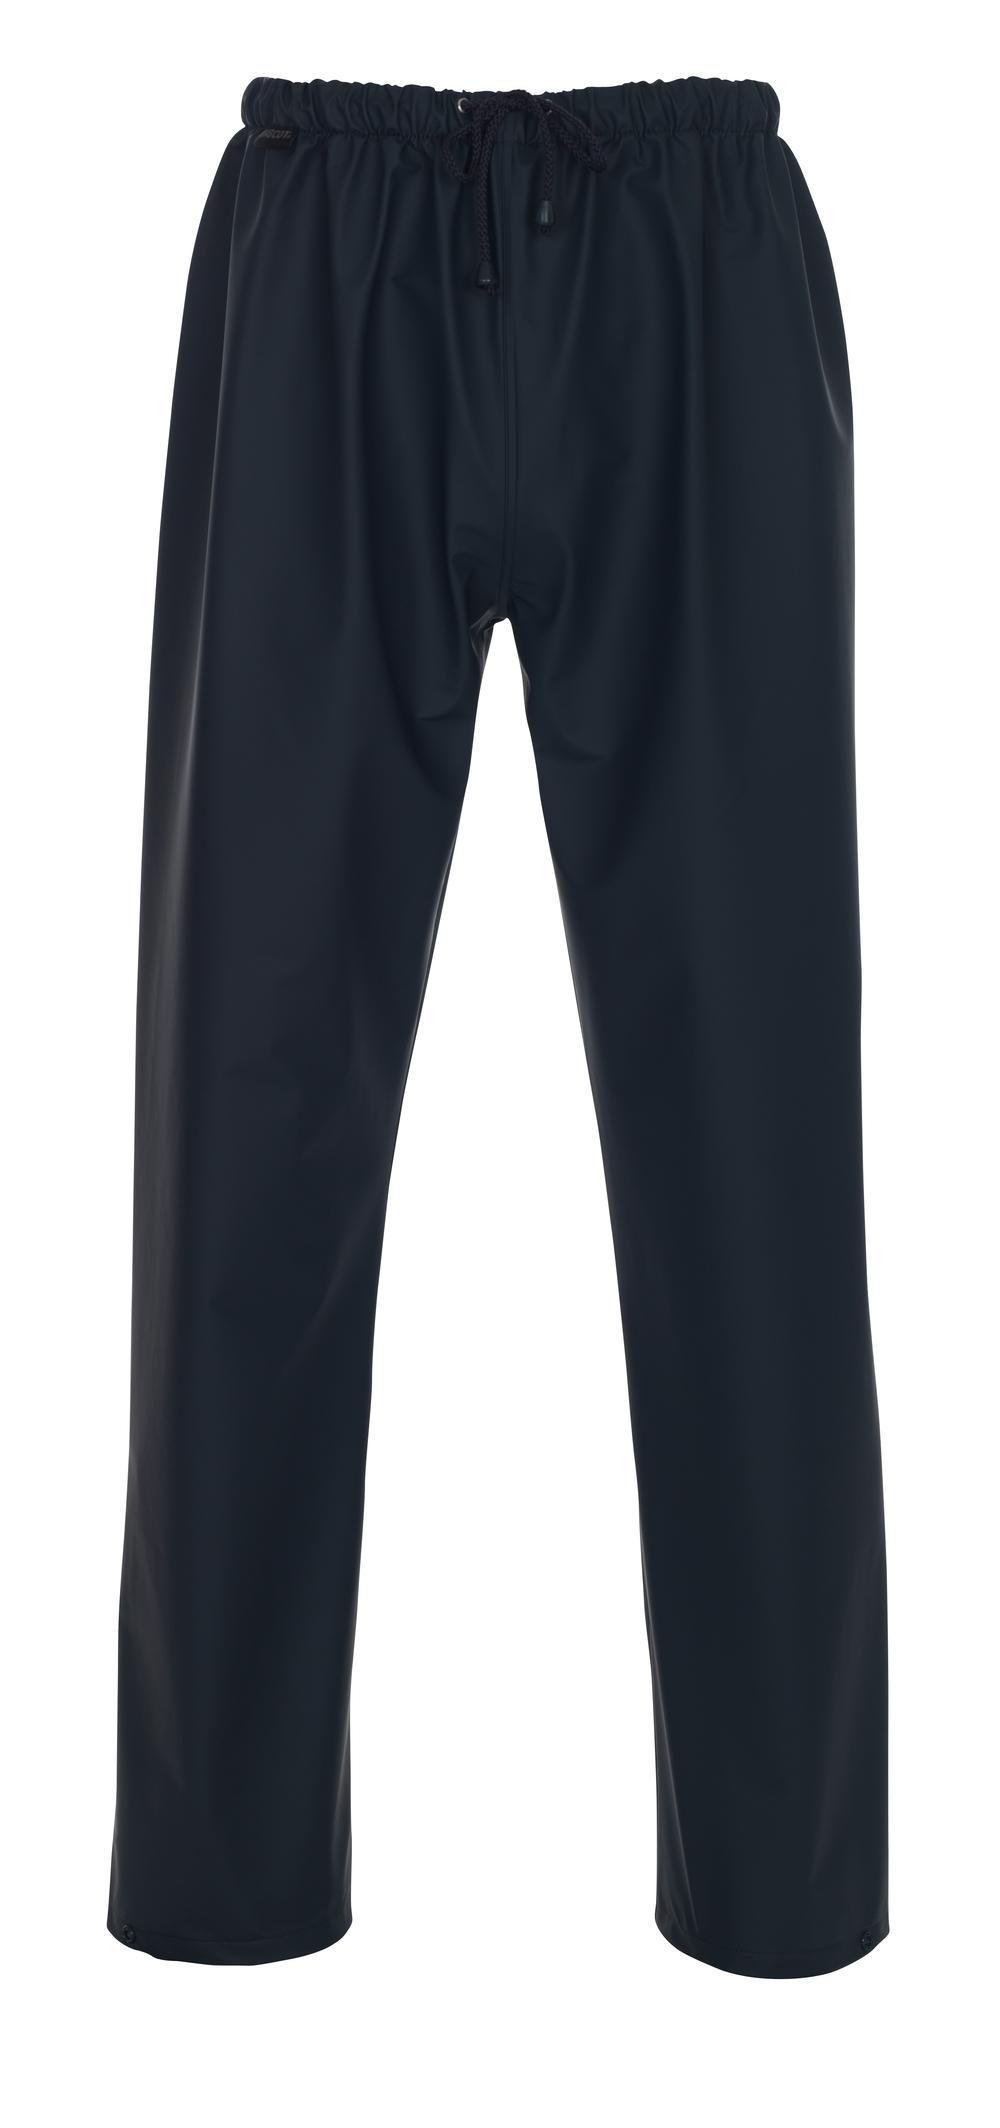 07062-028-01 Pantalon de pluie - Marine